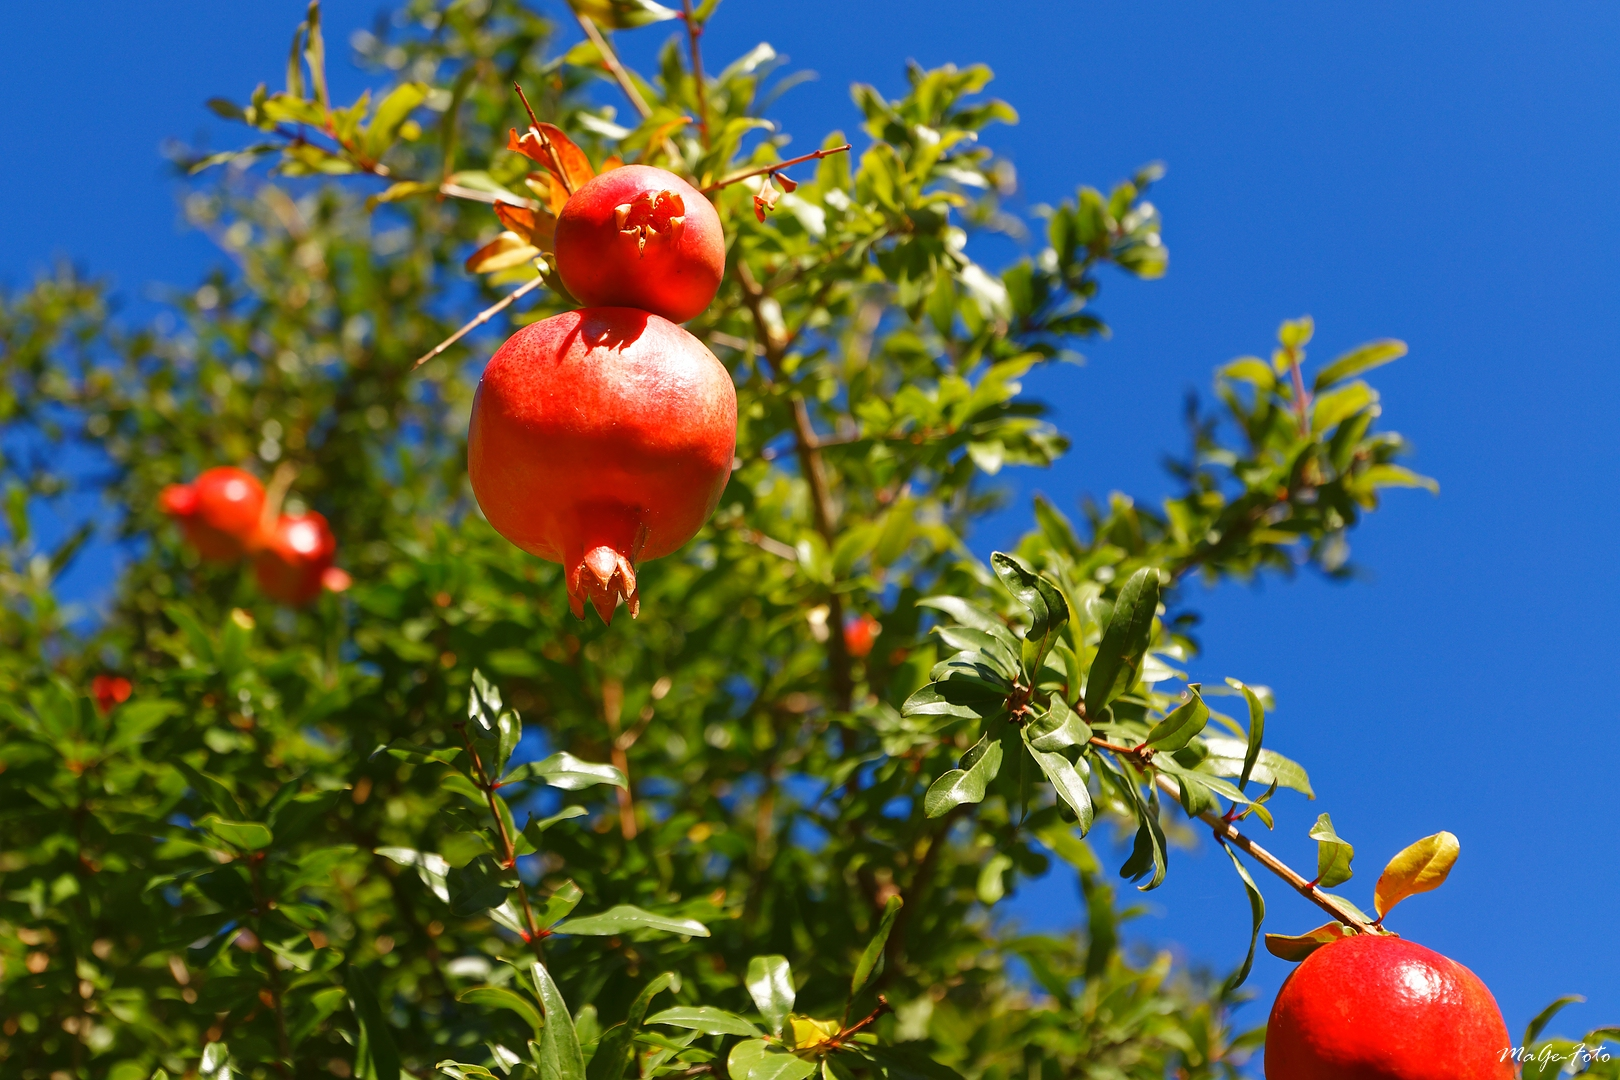 La Grenade / Granatäpfel